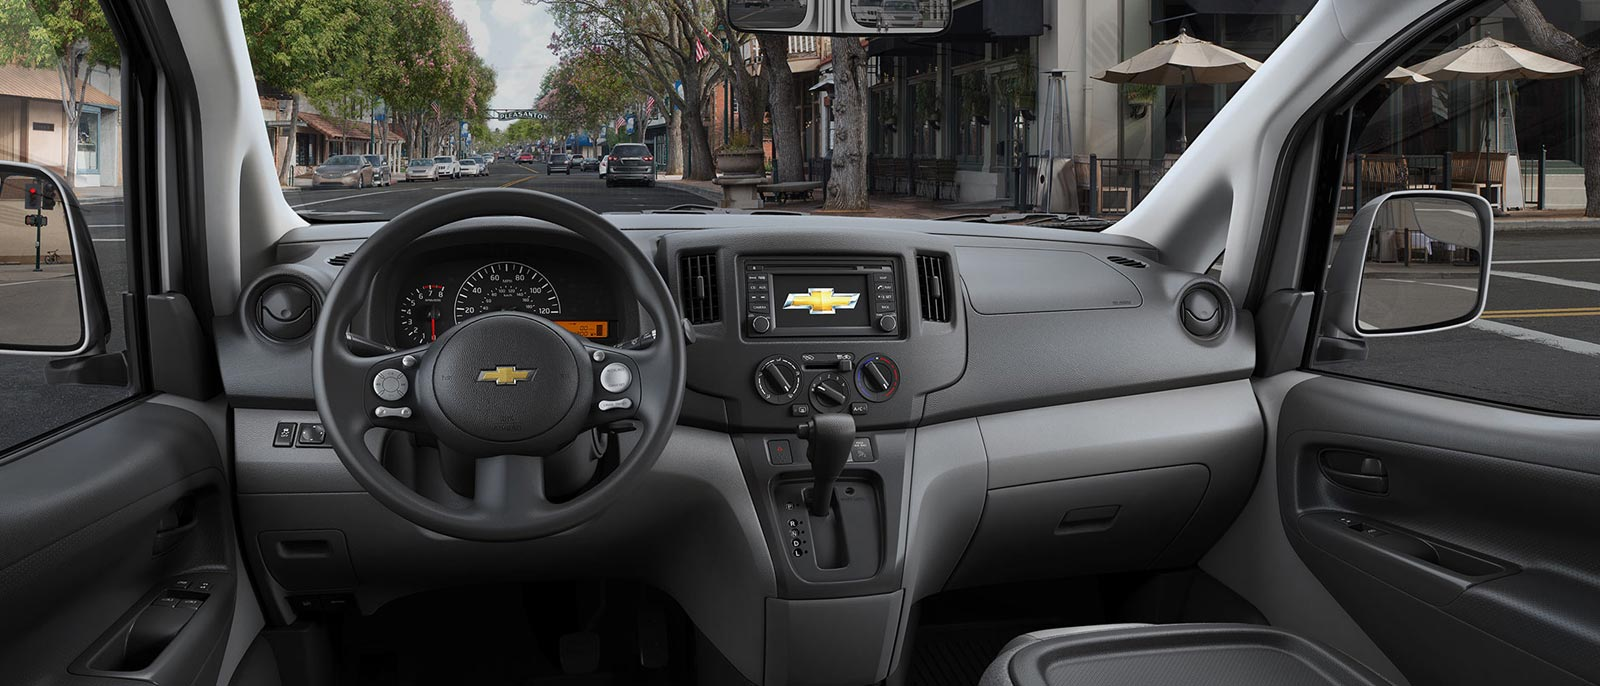 2015 Chevy City Express Interior